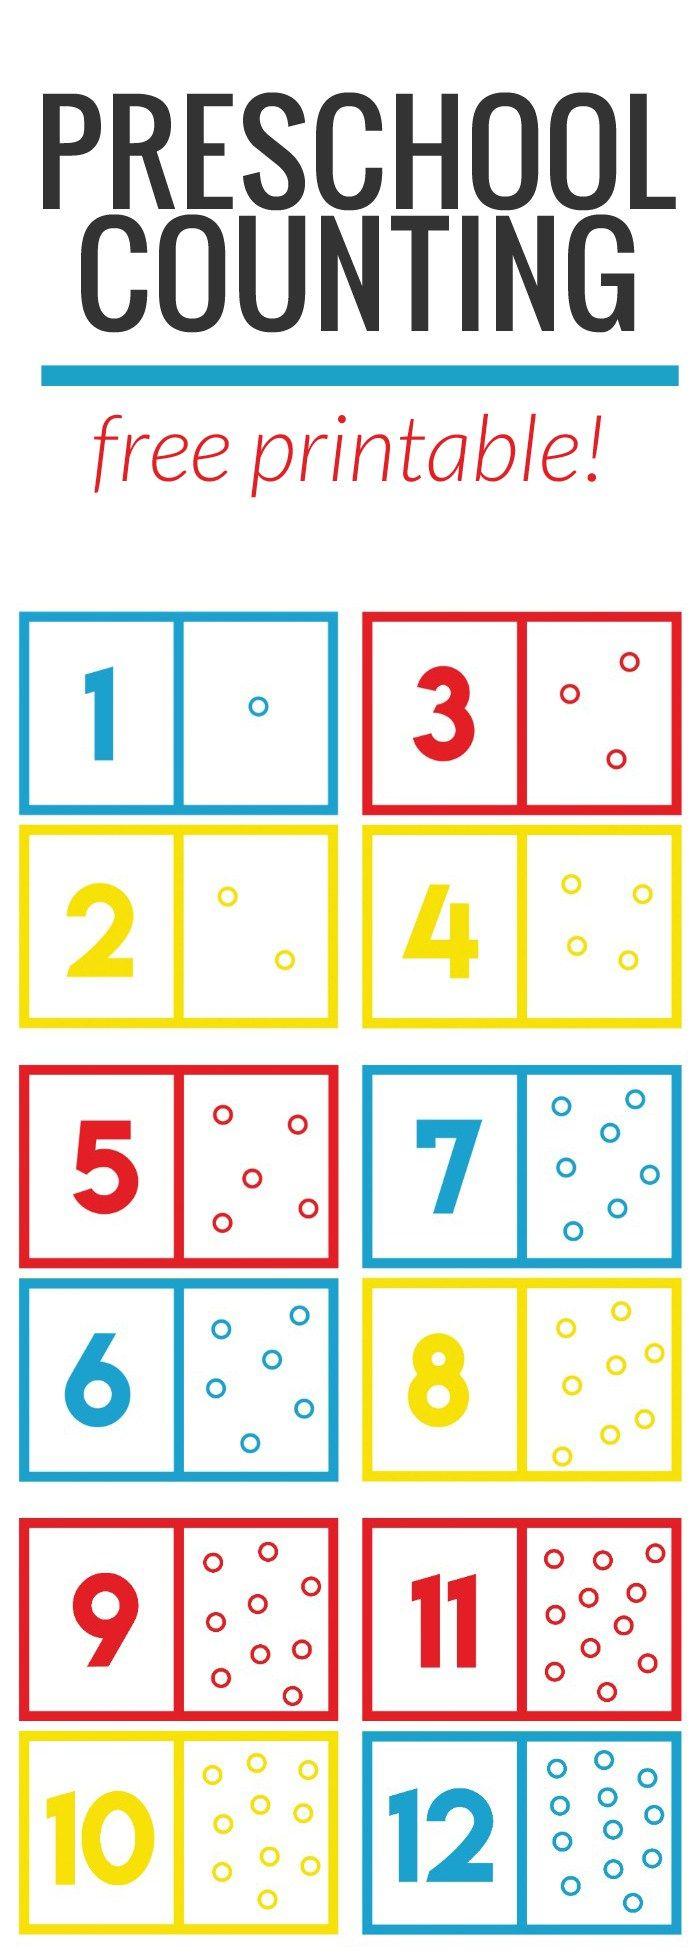 Preschool Math Counting Game + Free Printable! Preschool